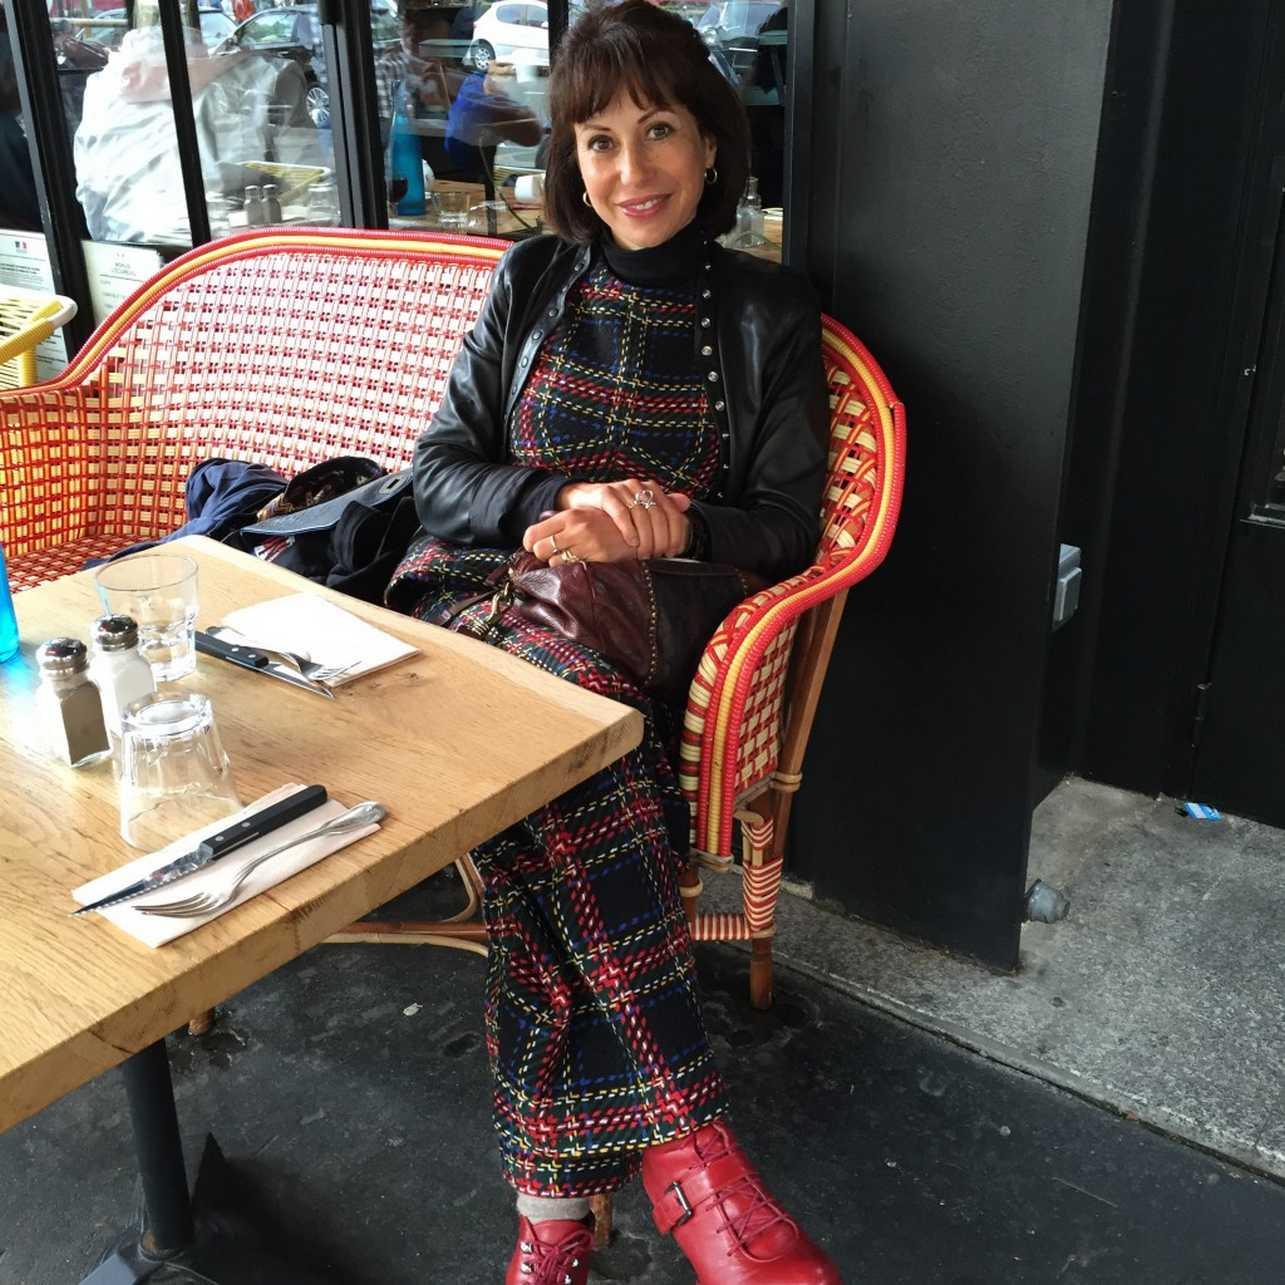 Mature - blog femmes 50 ans - quinqua - bien vieillir